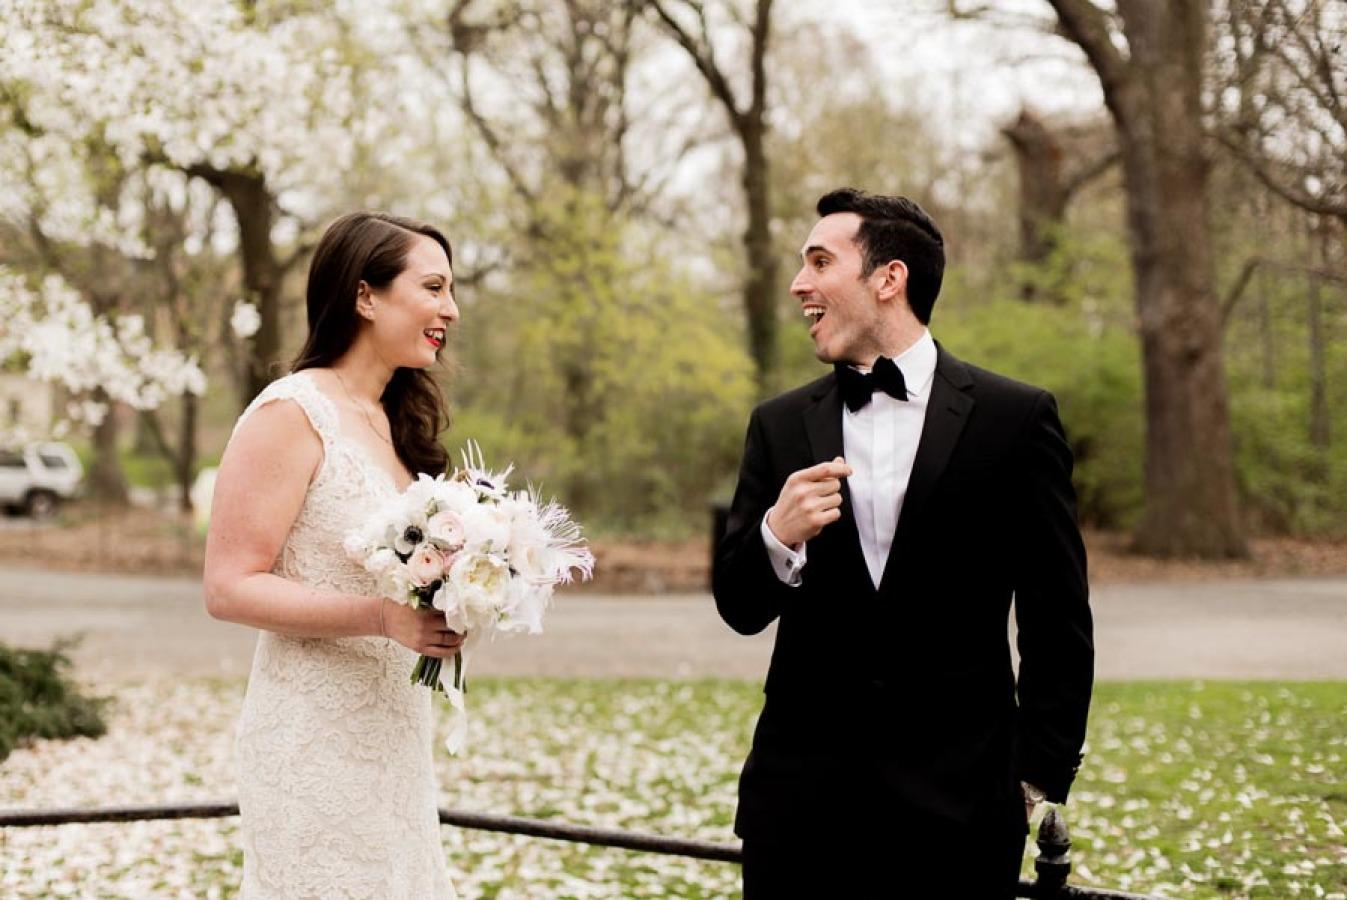 Botanical Garden Wedding Covered in Cherry Blossoms